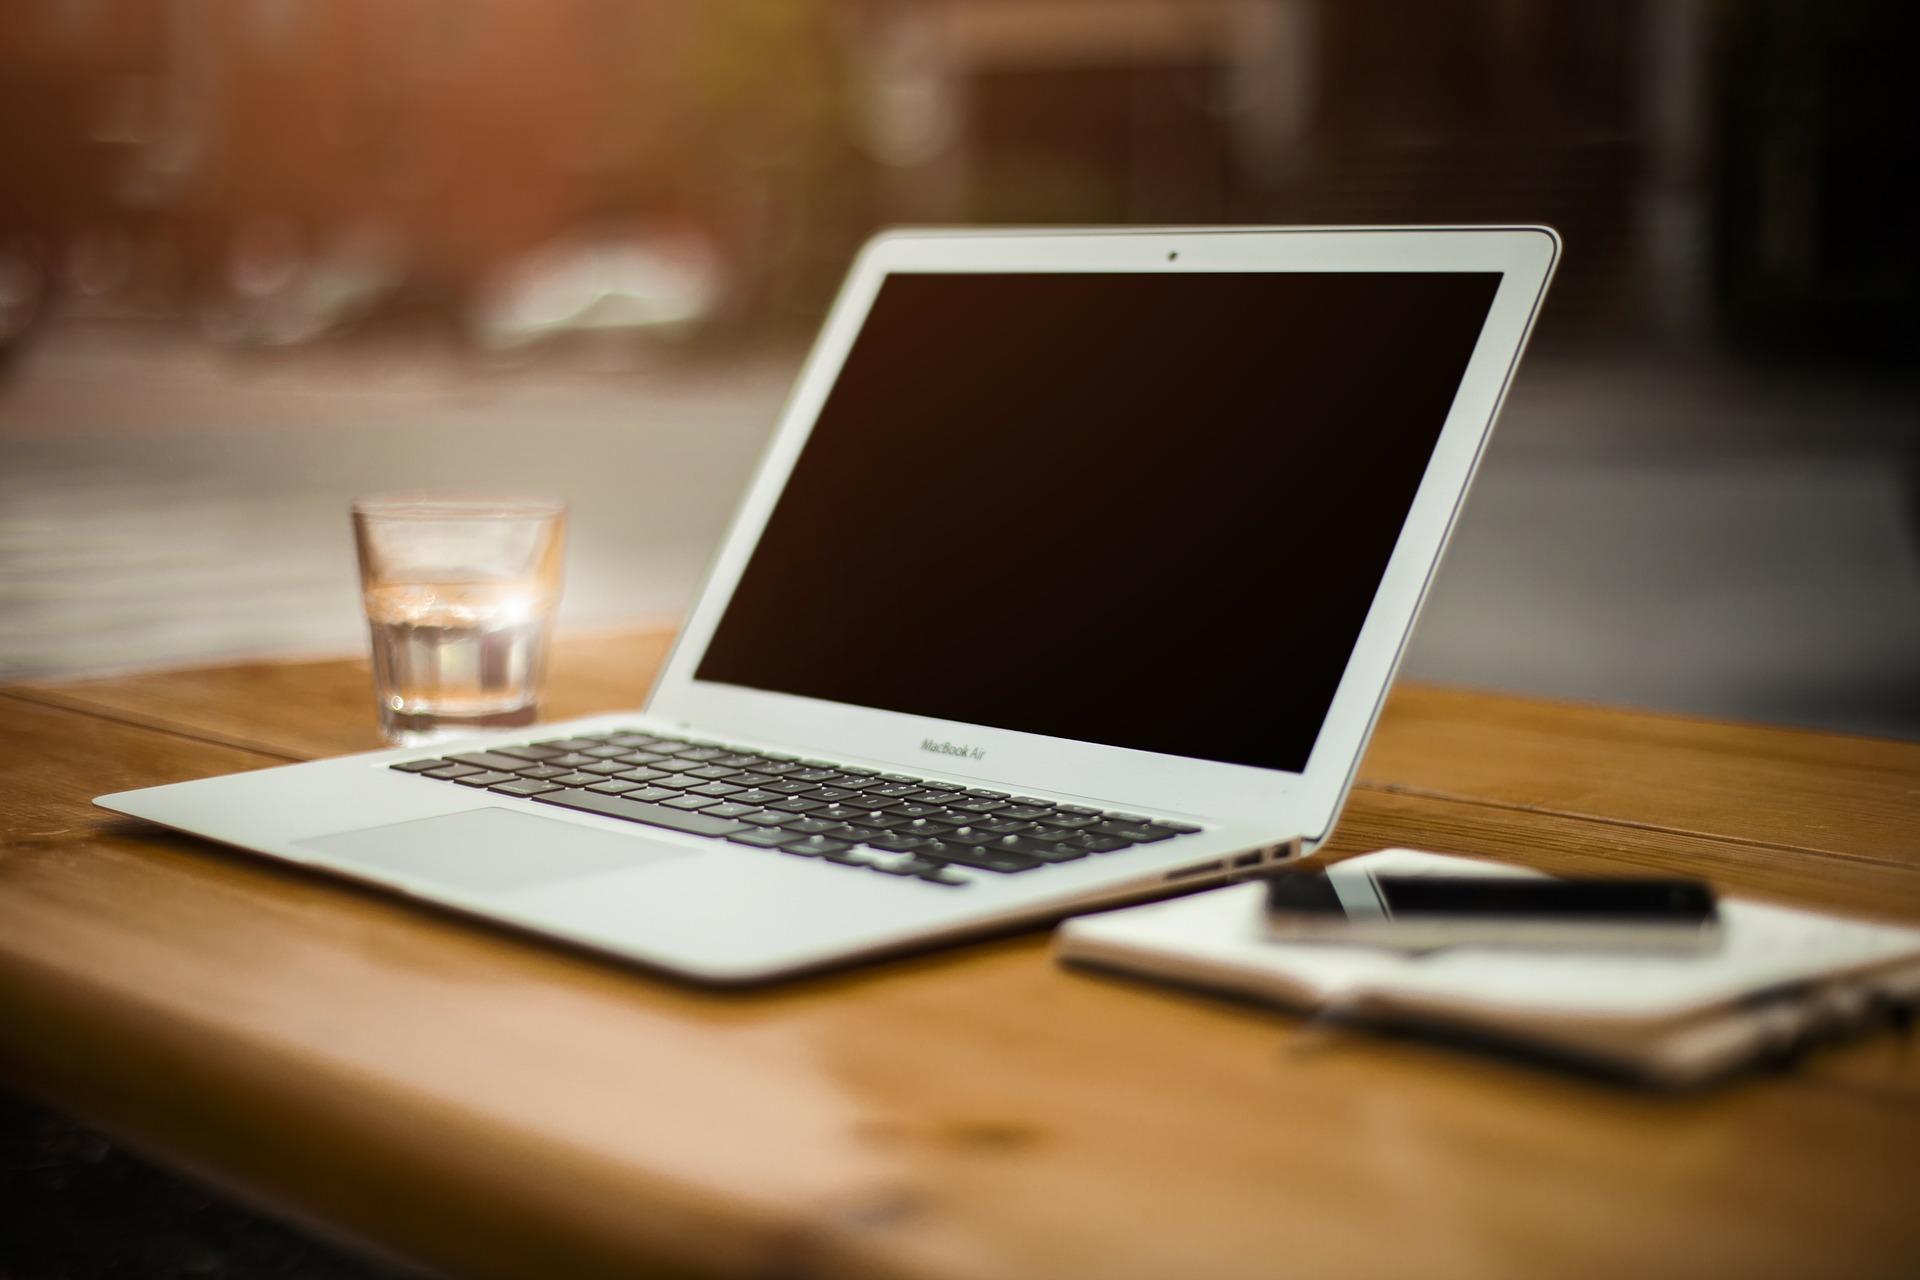 Coaching for writing, creativity, and organization.